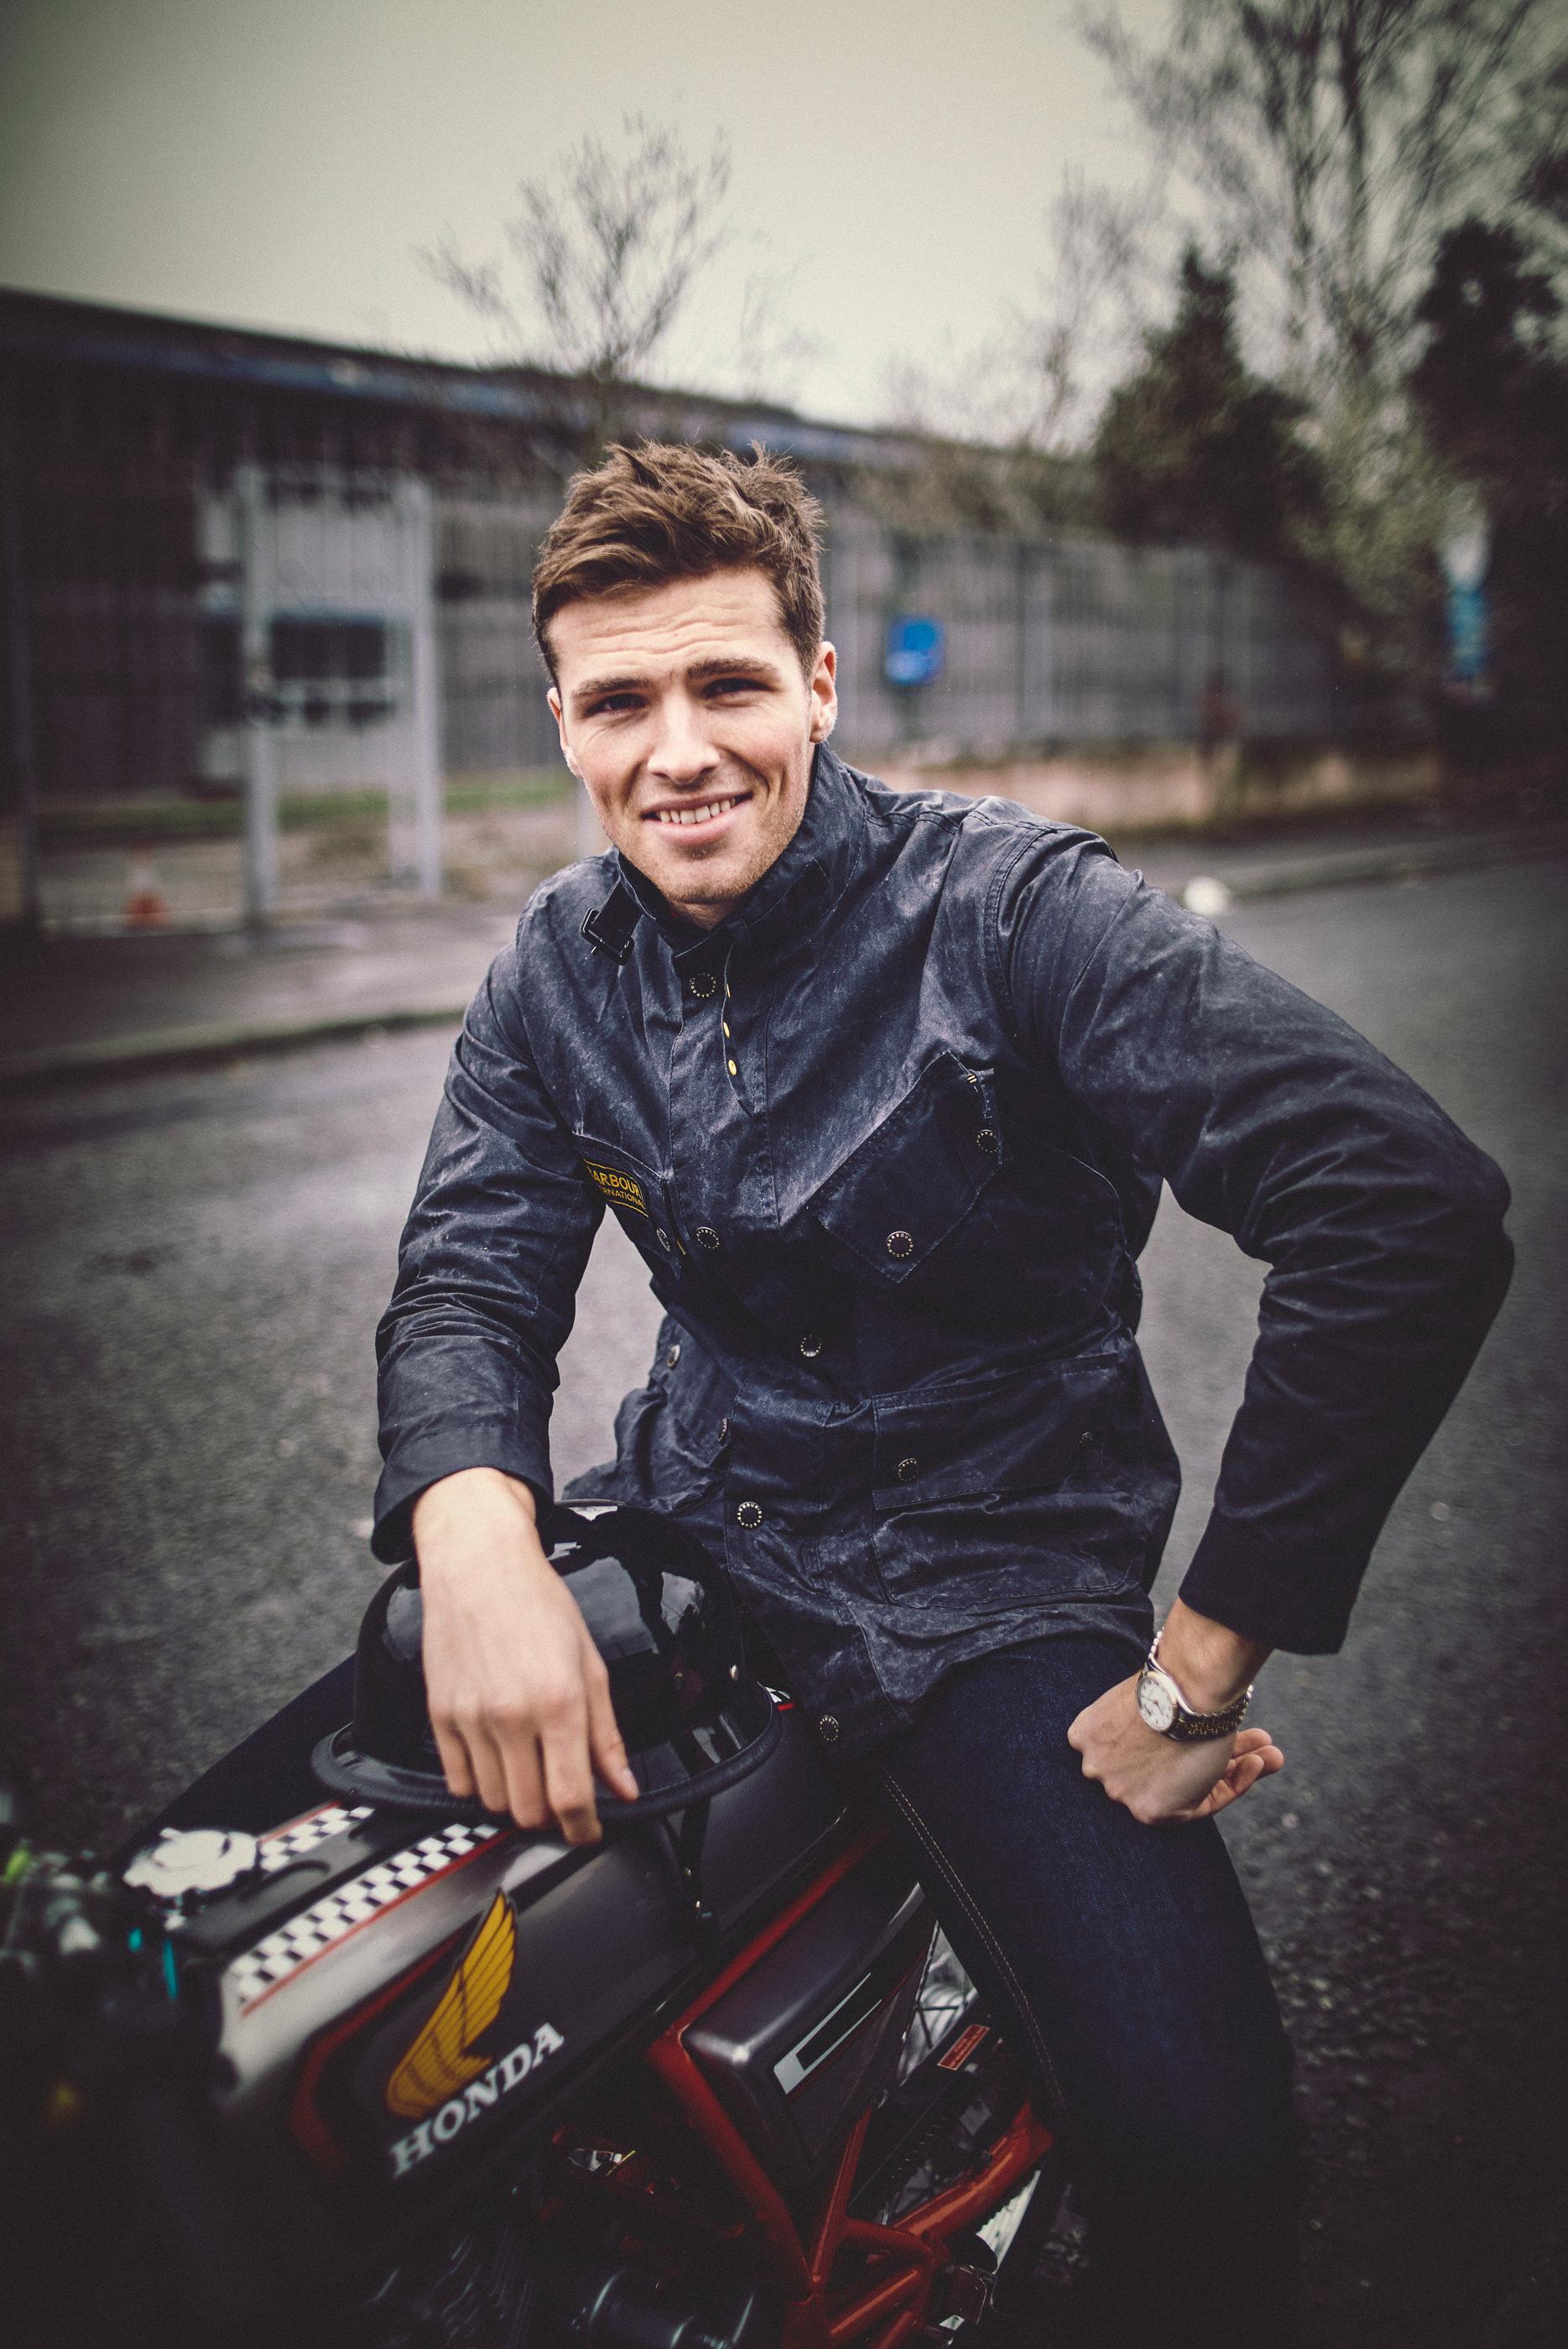 Matt-Stansfield-Photographer-editorial-fashion-lifestyle-edward-wilding-549